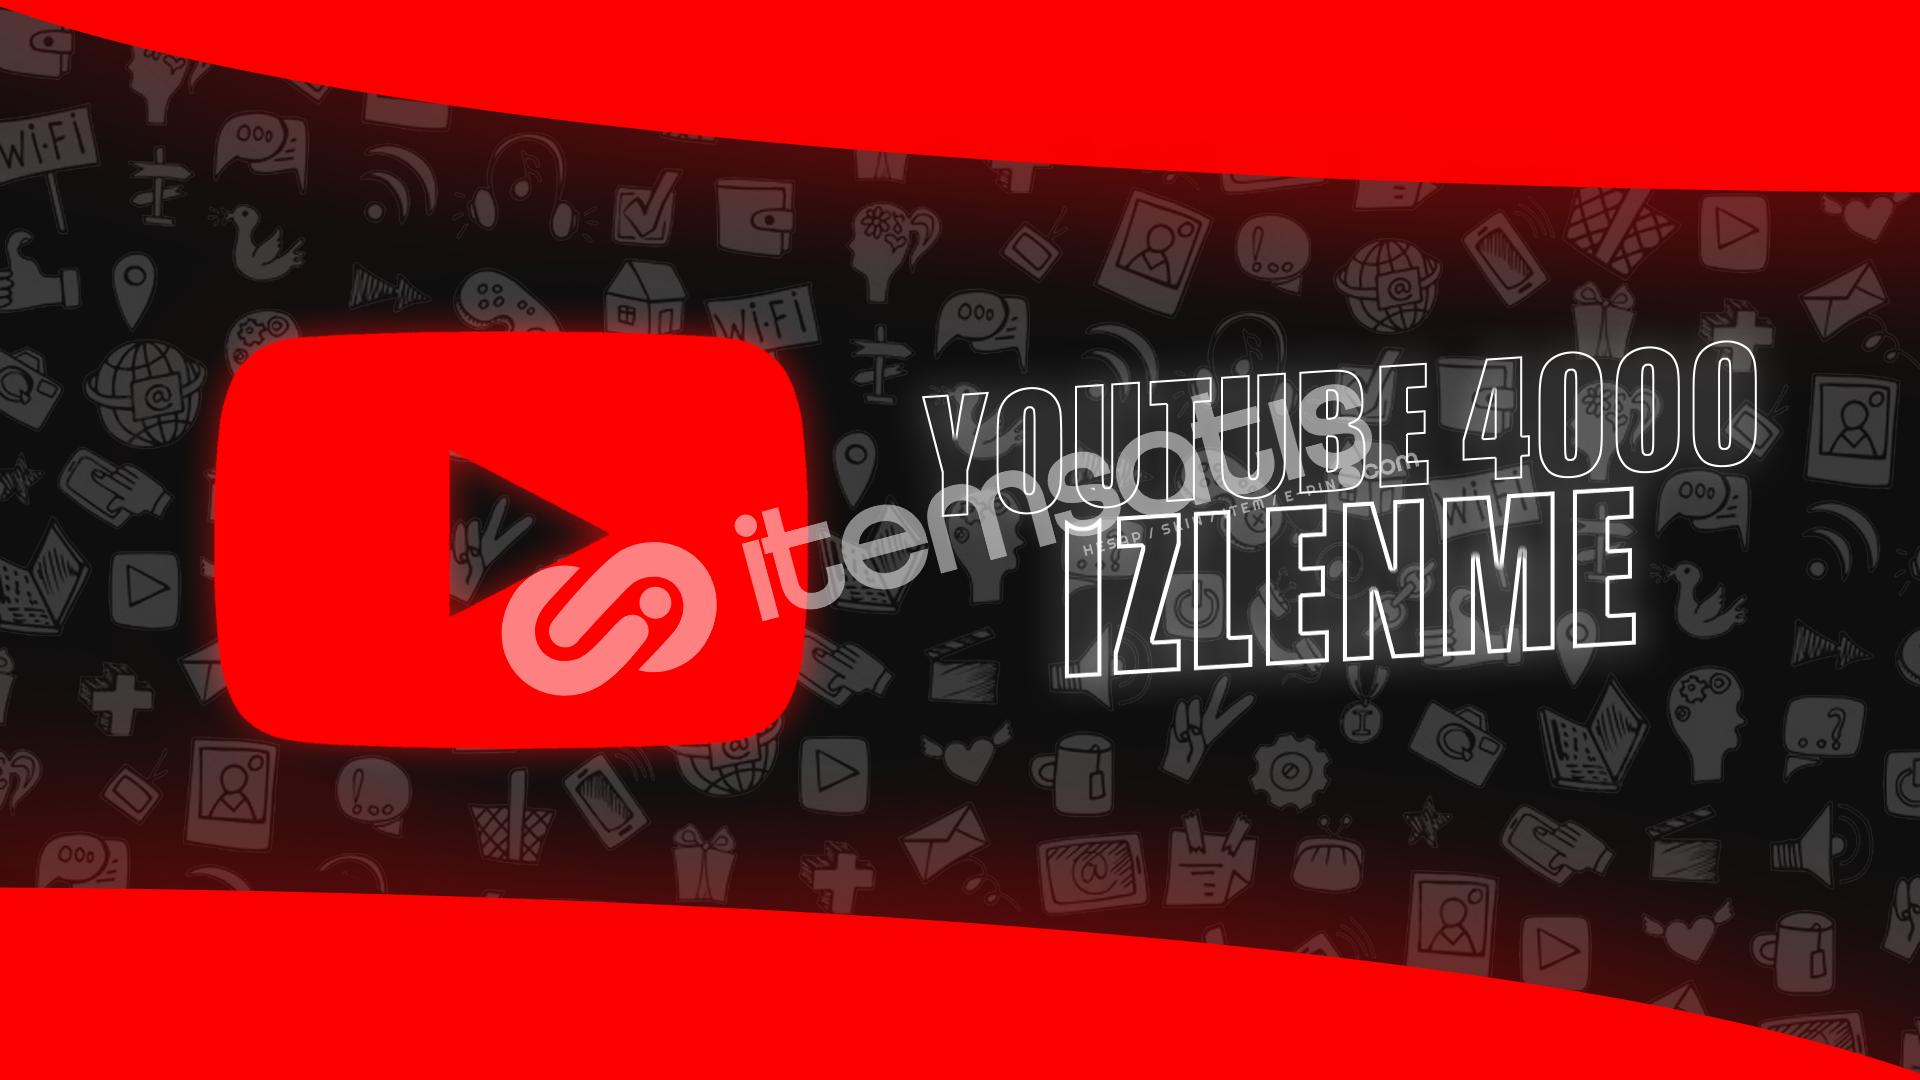 Çalışan Tek Servis! YouTube 4000 İzlenme - 24TL